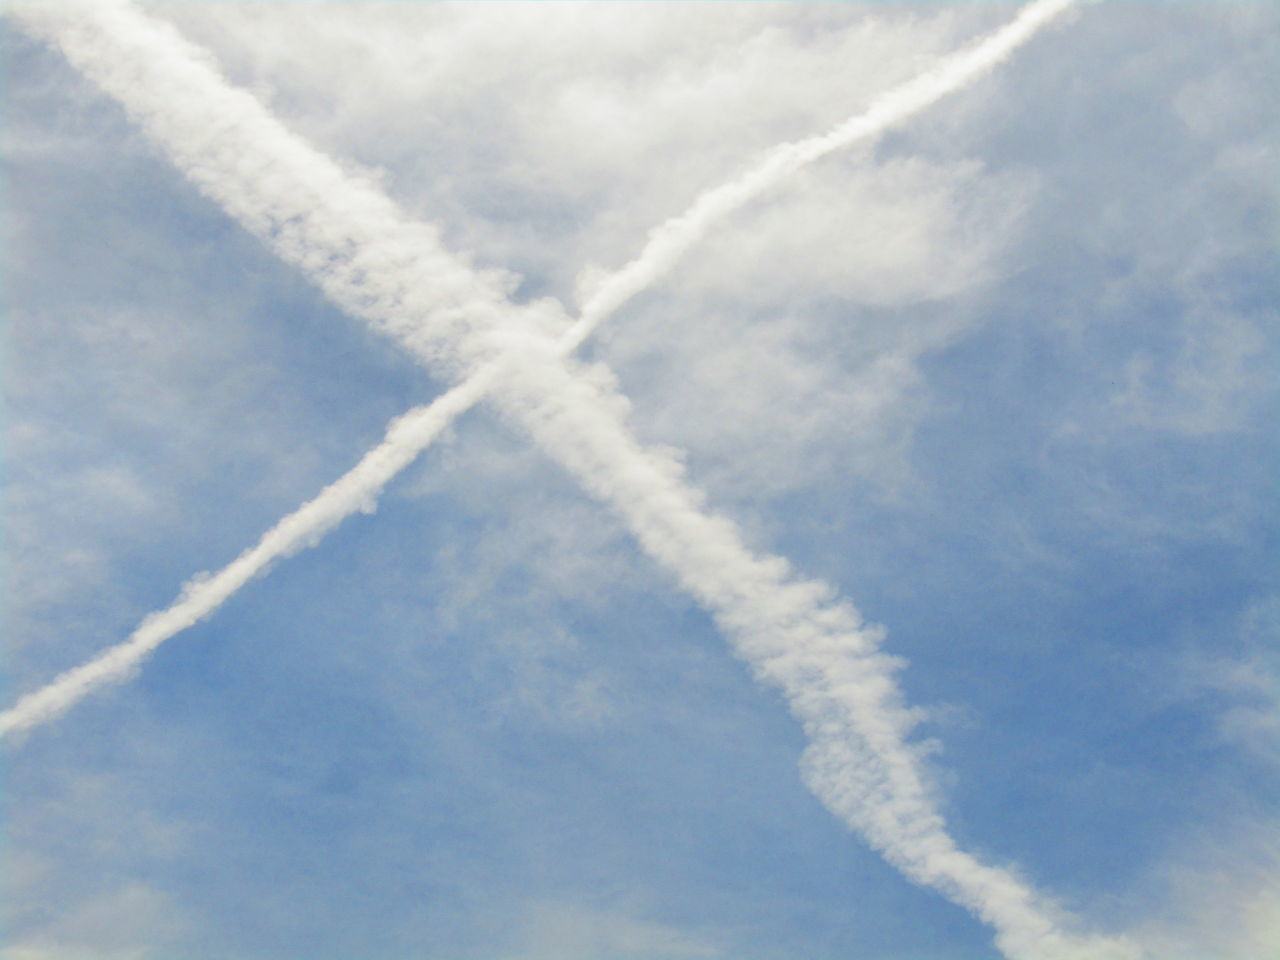 Himmel Chemtrail Chemtrails Contrail Kondensstreifen Sky Vapor Trail